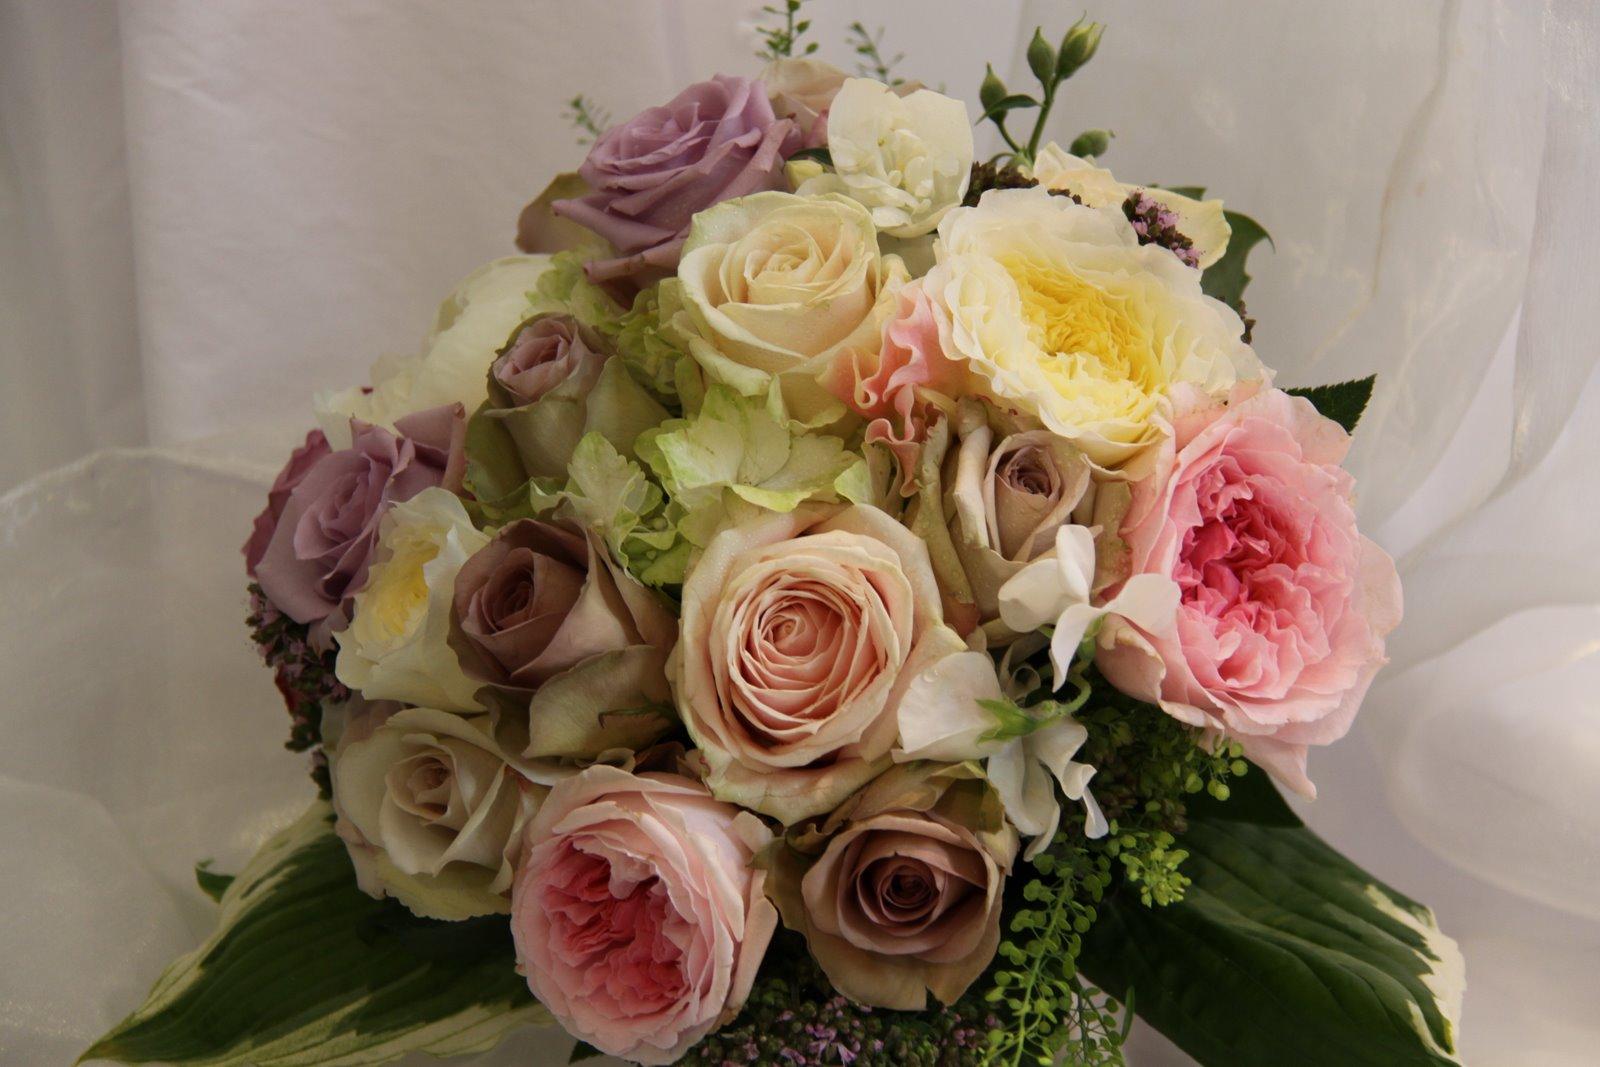 Vintage Floral Wedding Bouquets : The flower magician vintage rose wedding bouquet